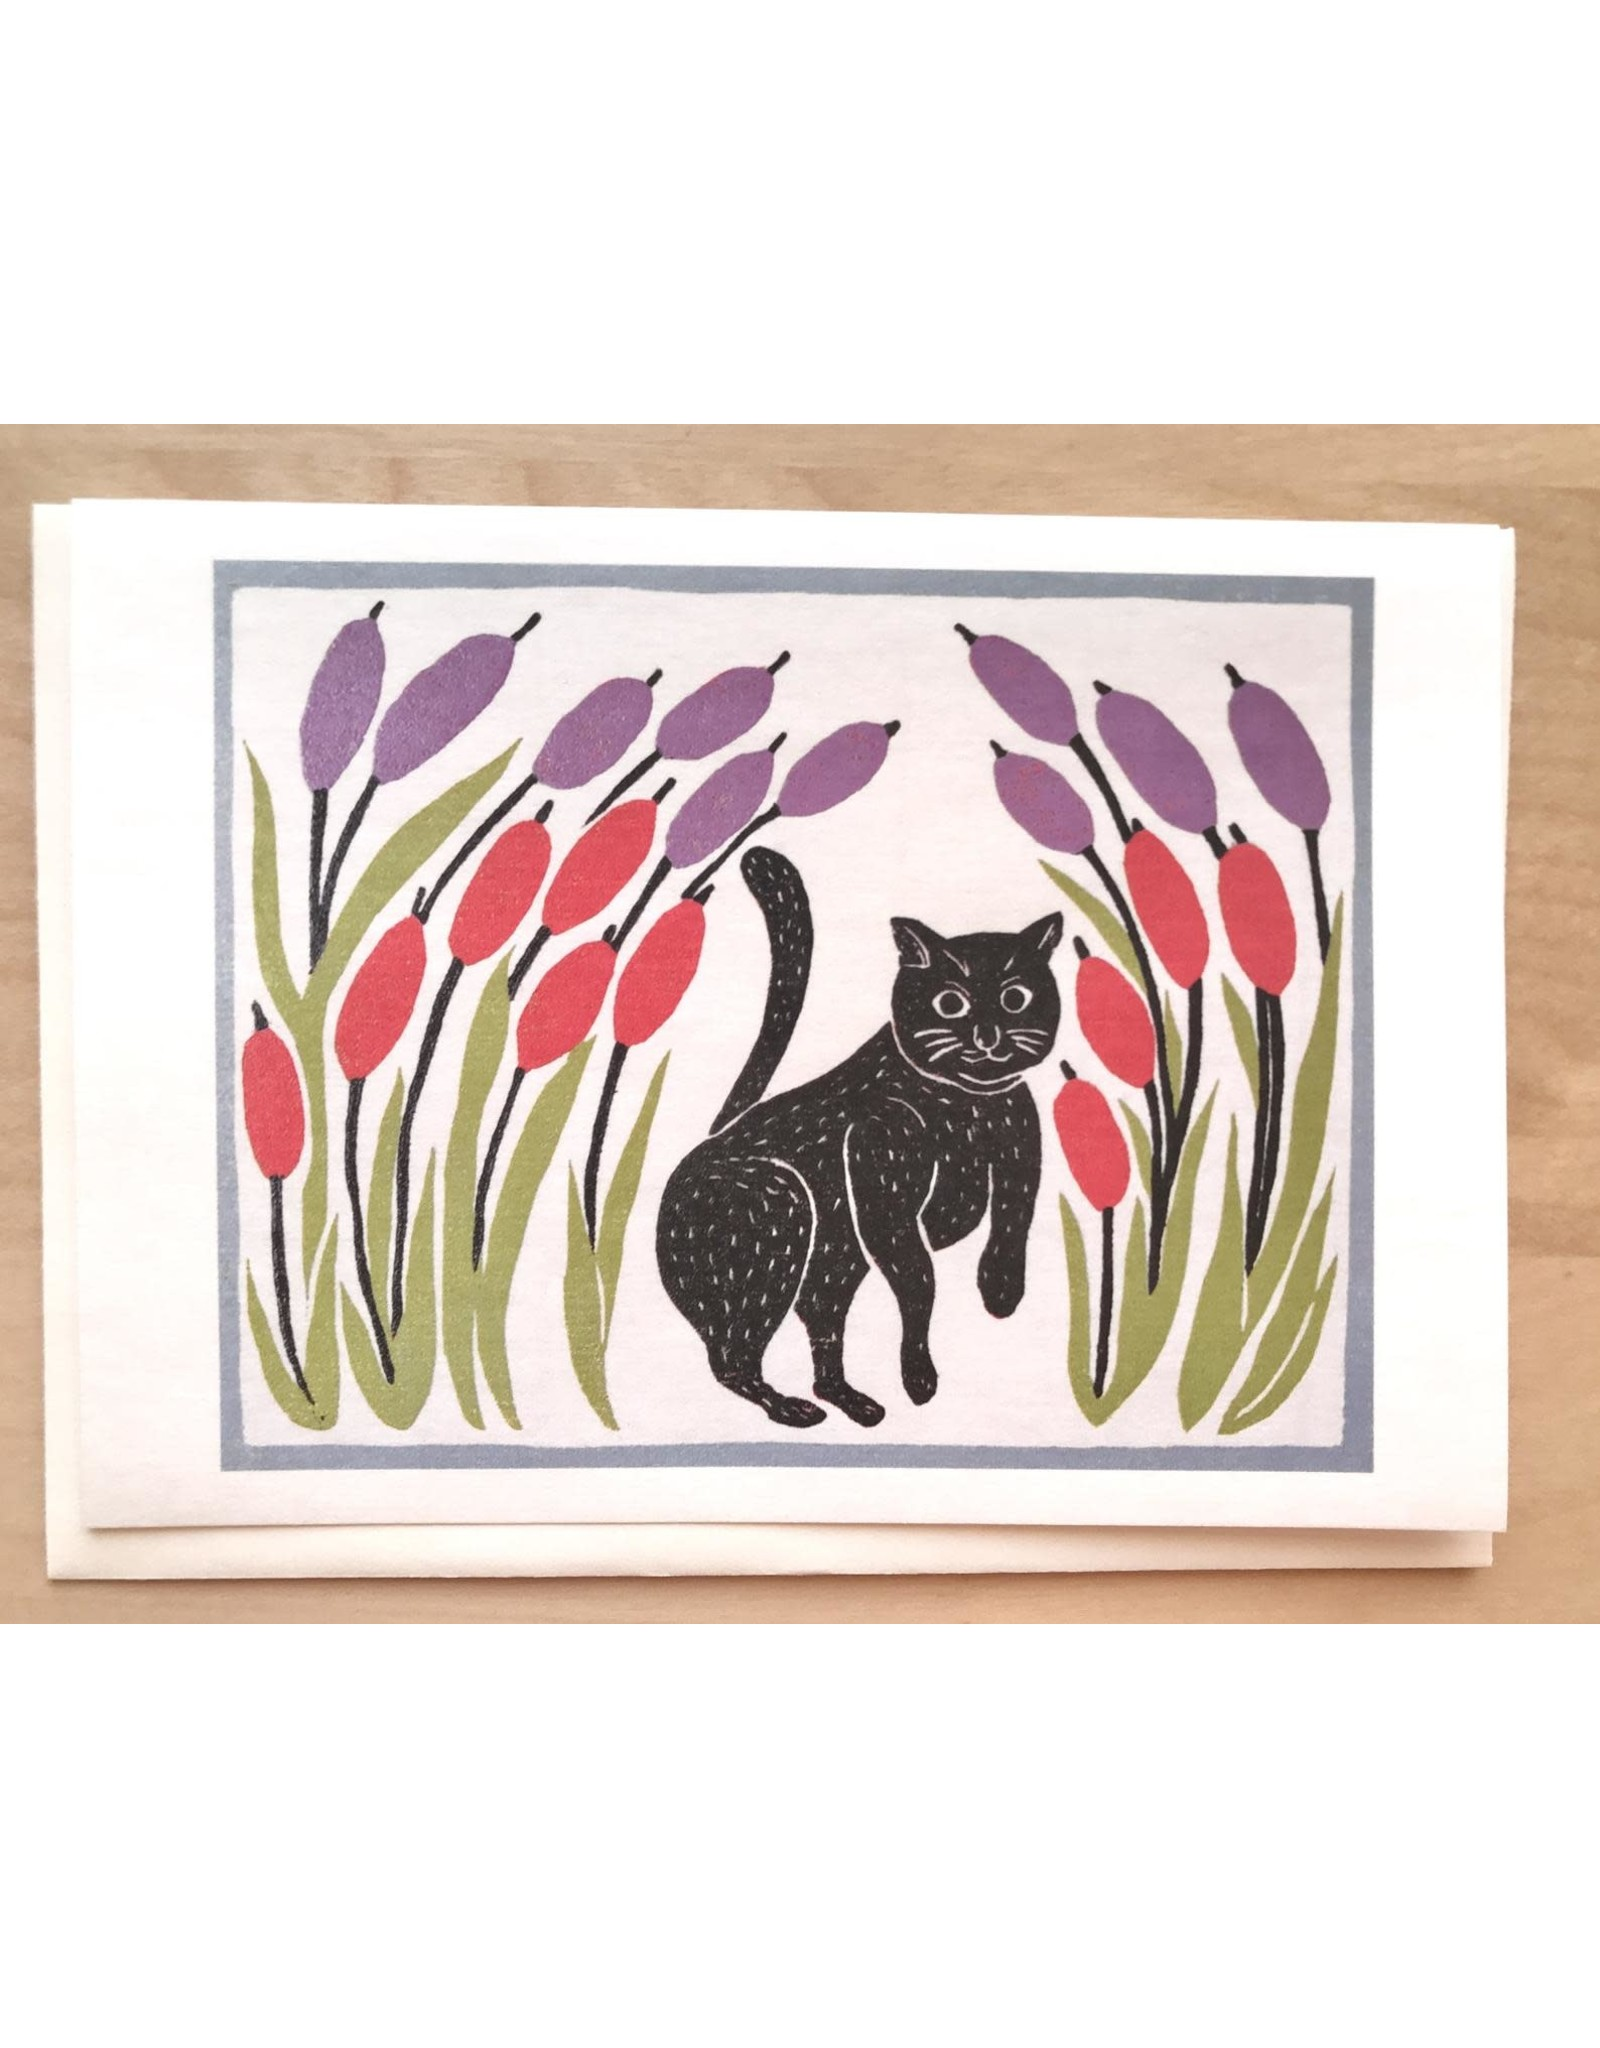 DogwoodStudioAlaska Cat-tail | Yumi Kawaguchi